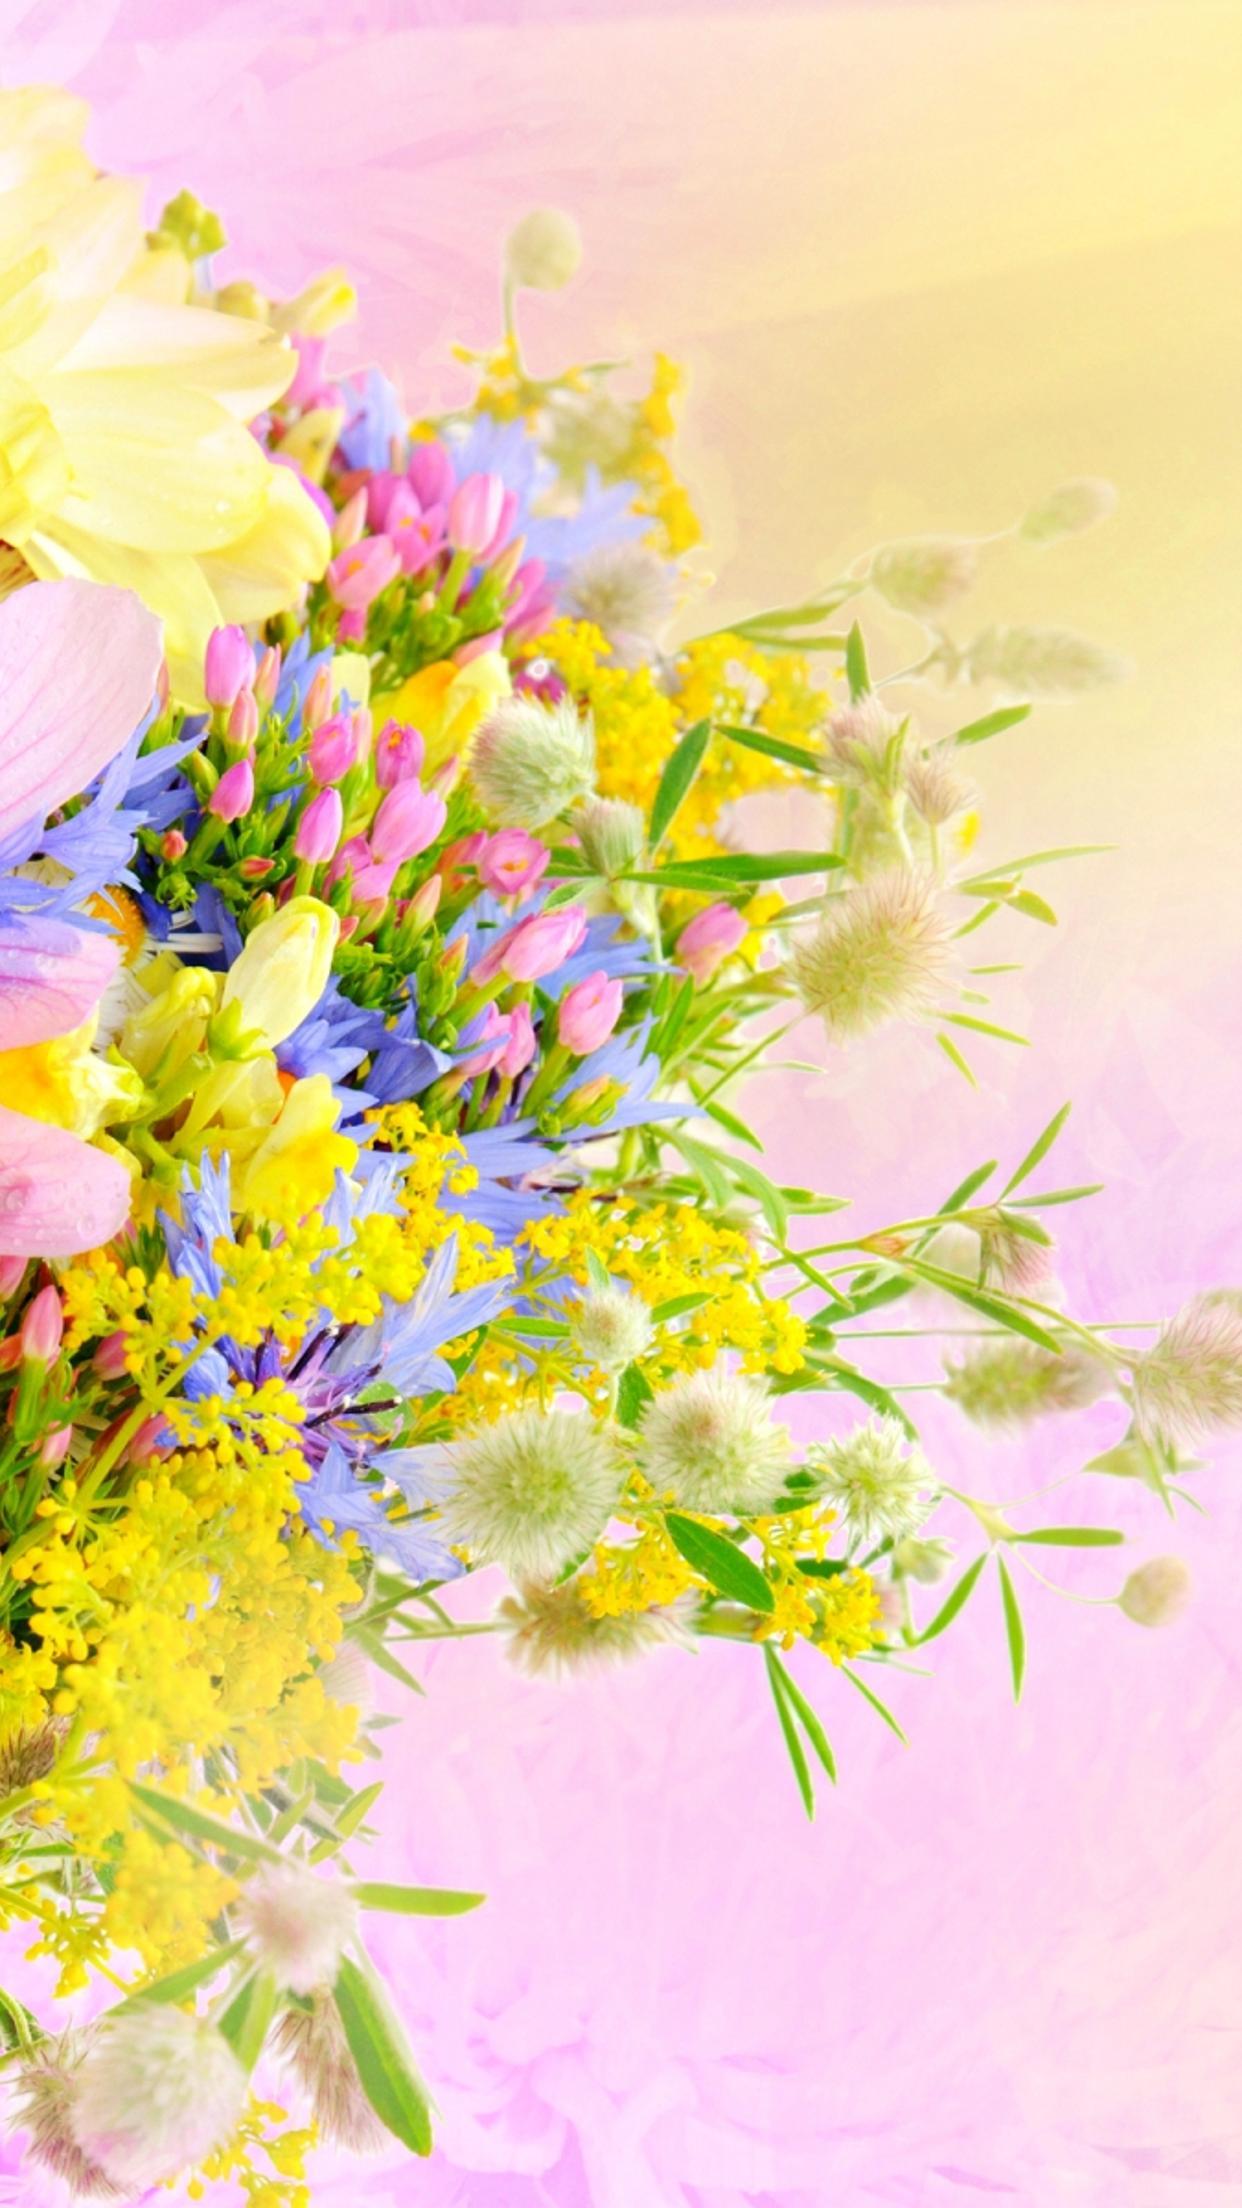 Spring flower perfume wonderful bouquet wallpaper download 1242x2208 mightylinksfo